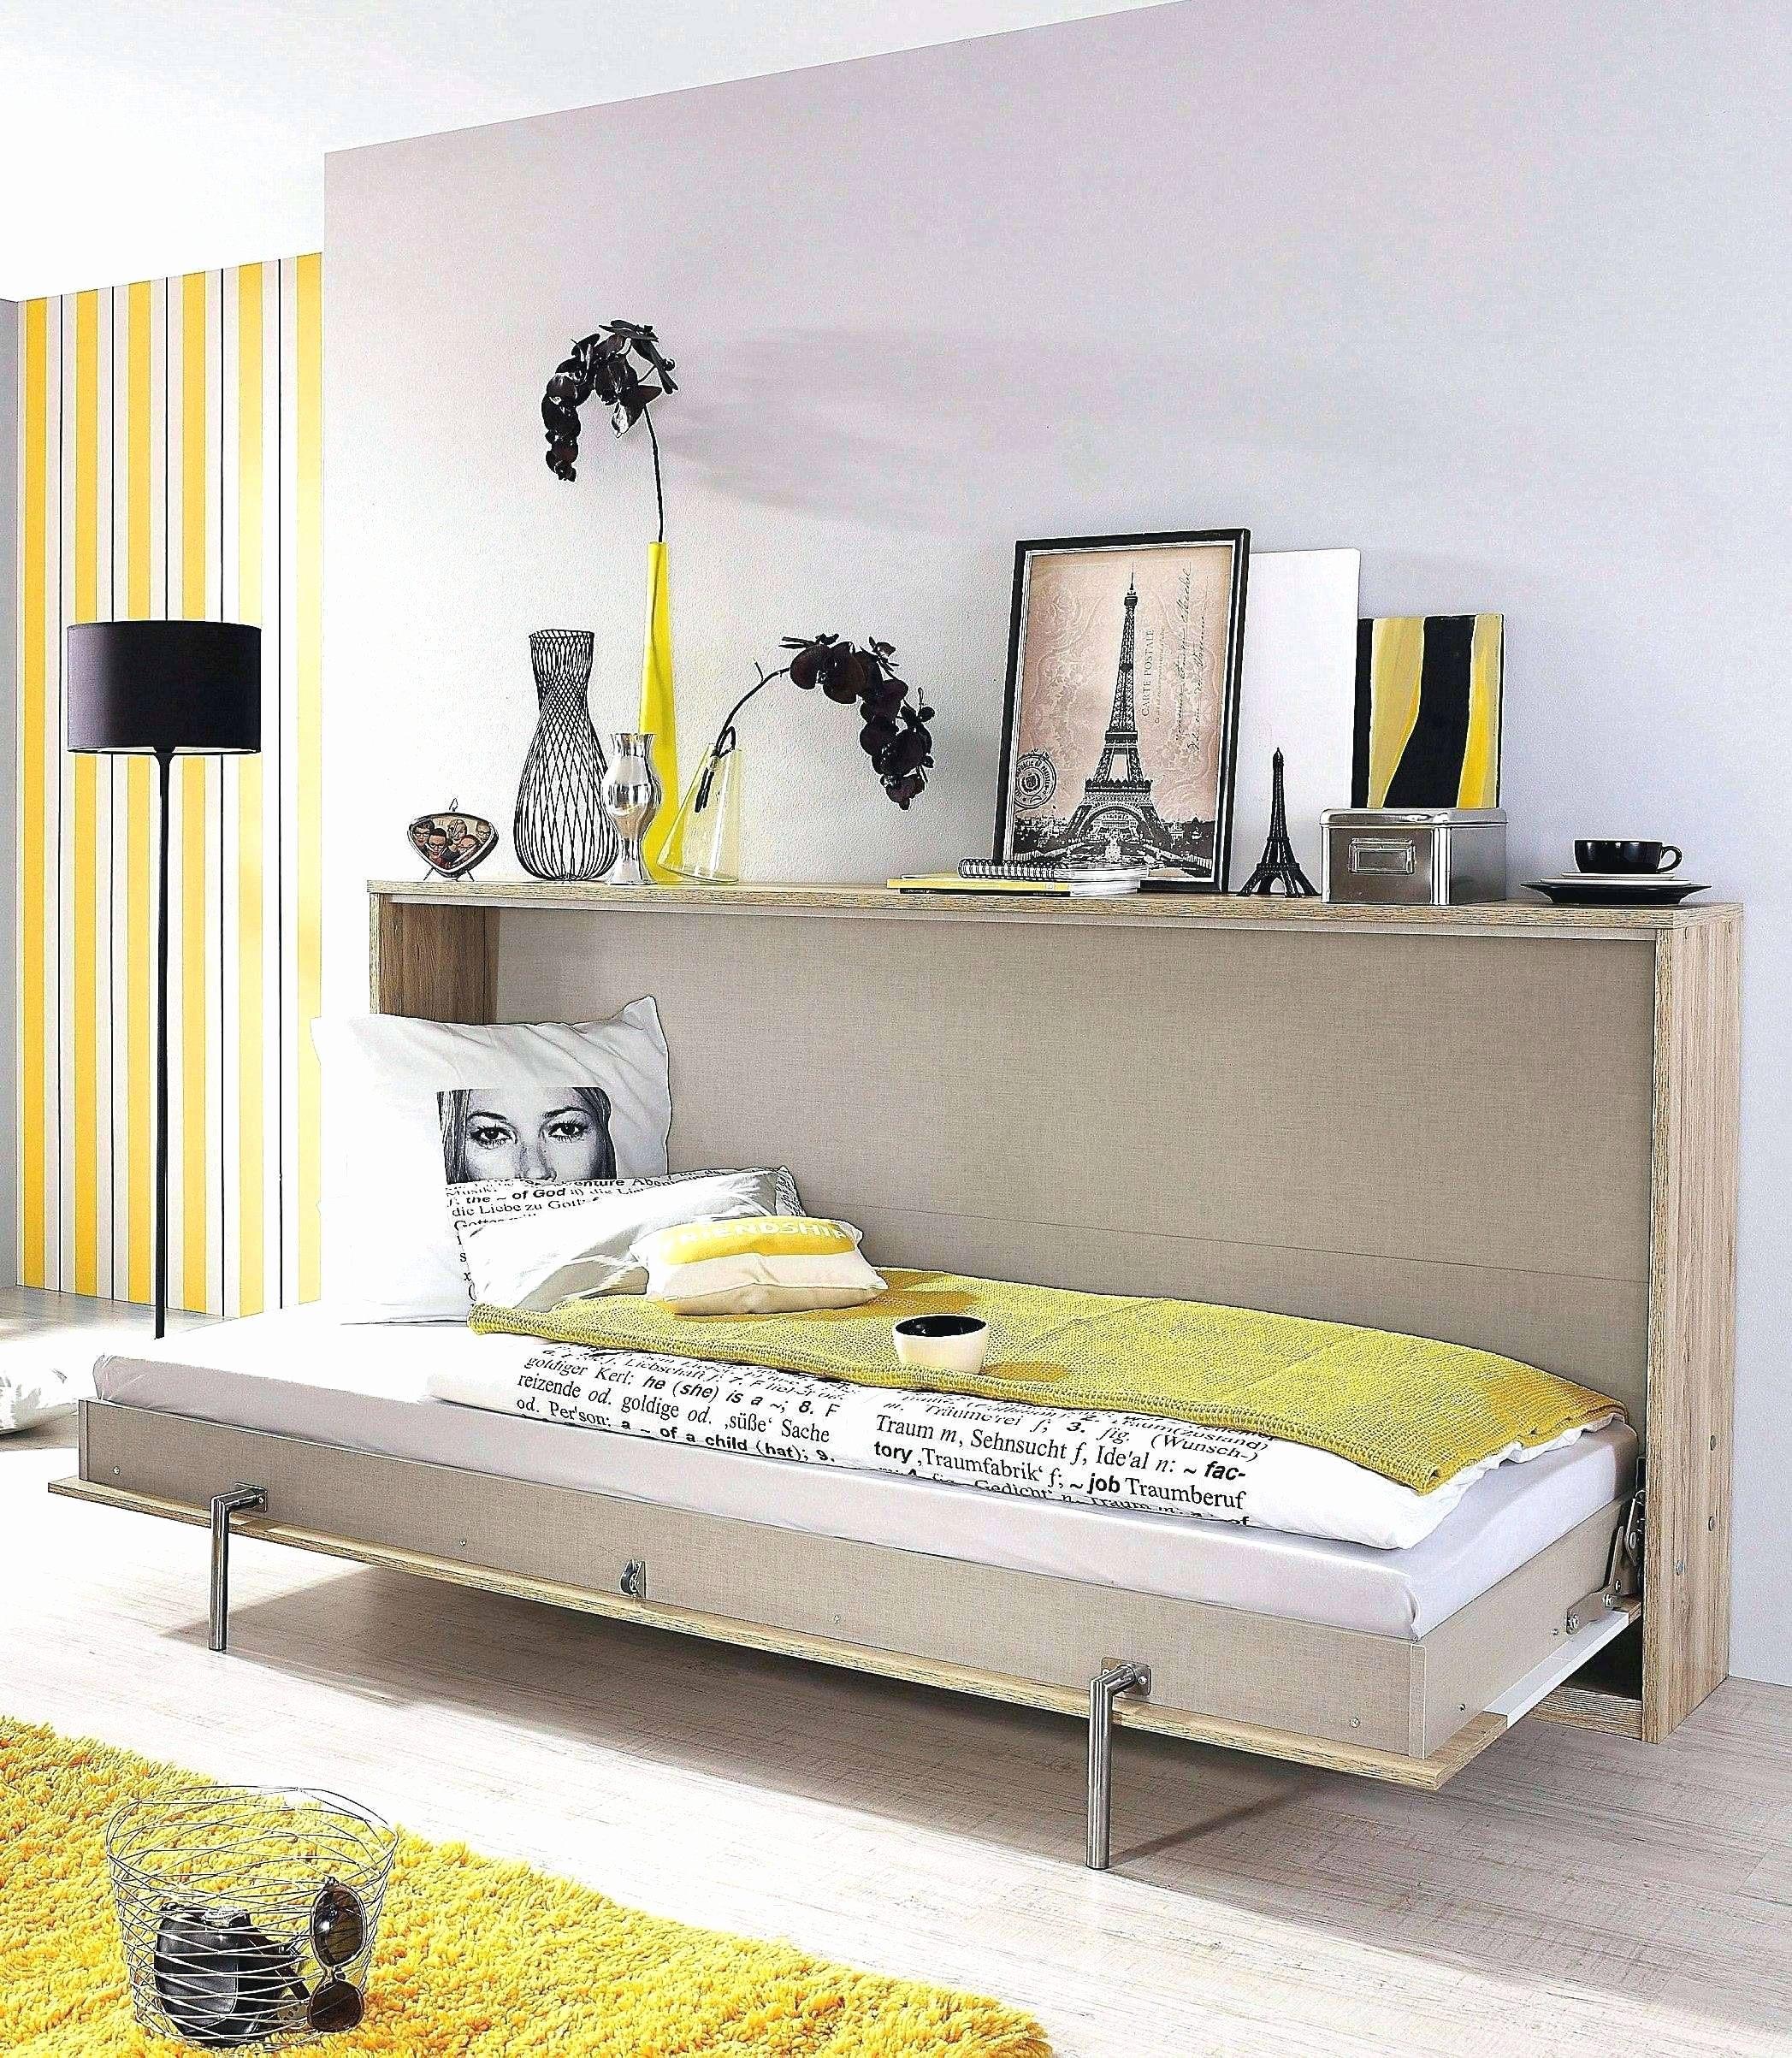 Lit Futon 160×200 Charmant Matelas Ikea 160—200 Beau Lit A Tiroir Ikea Cadre De Lit Trysil